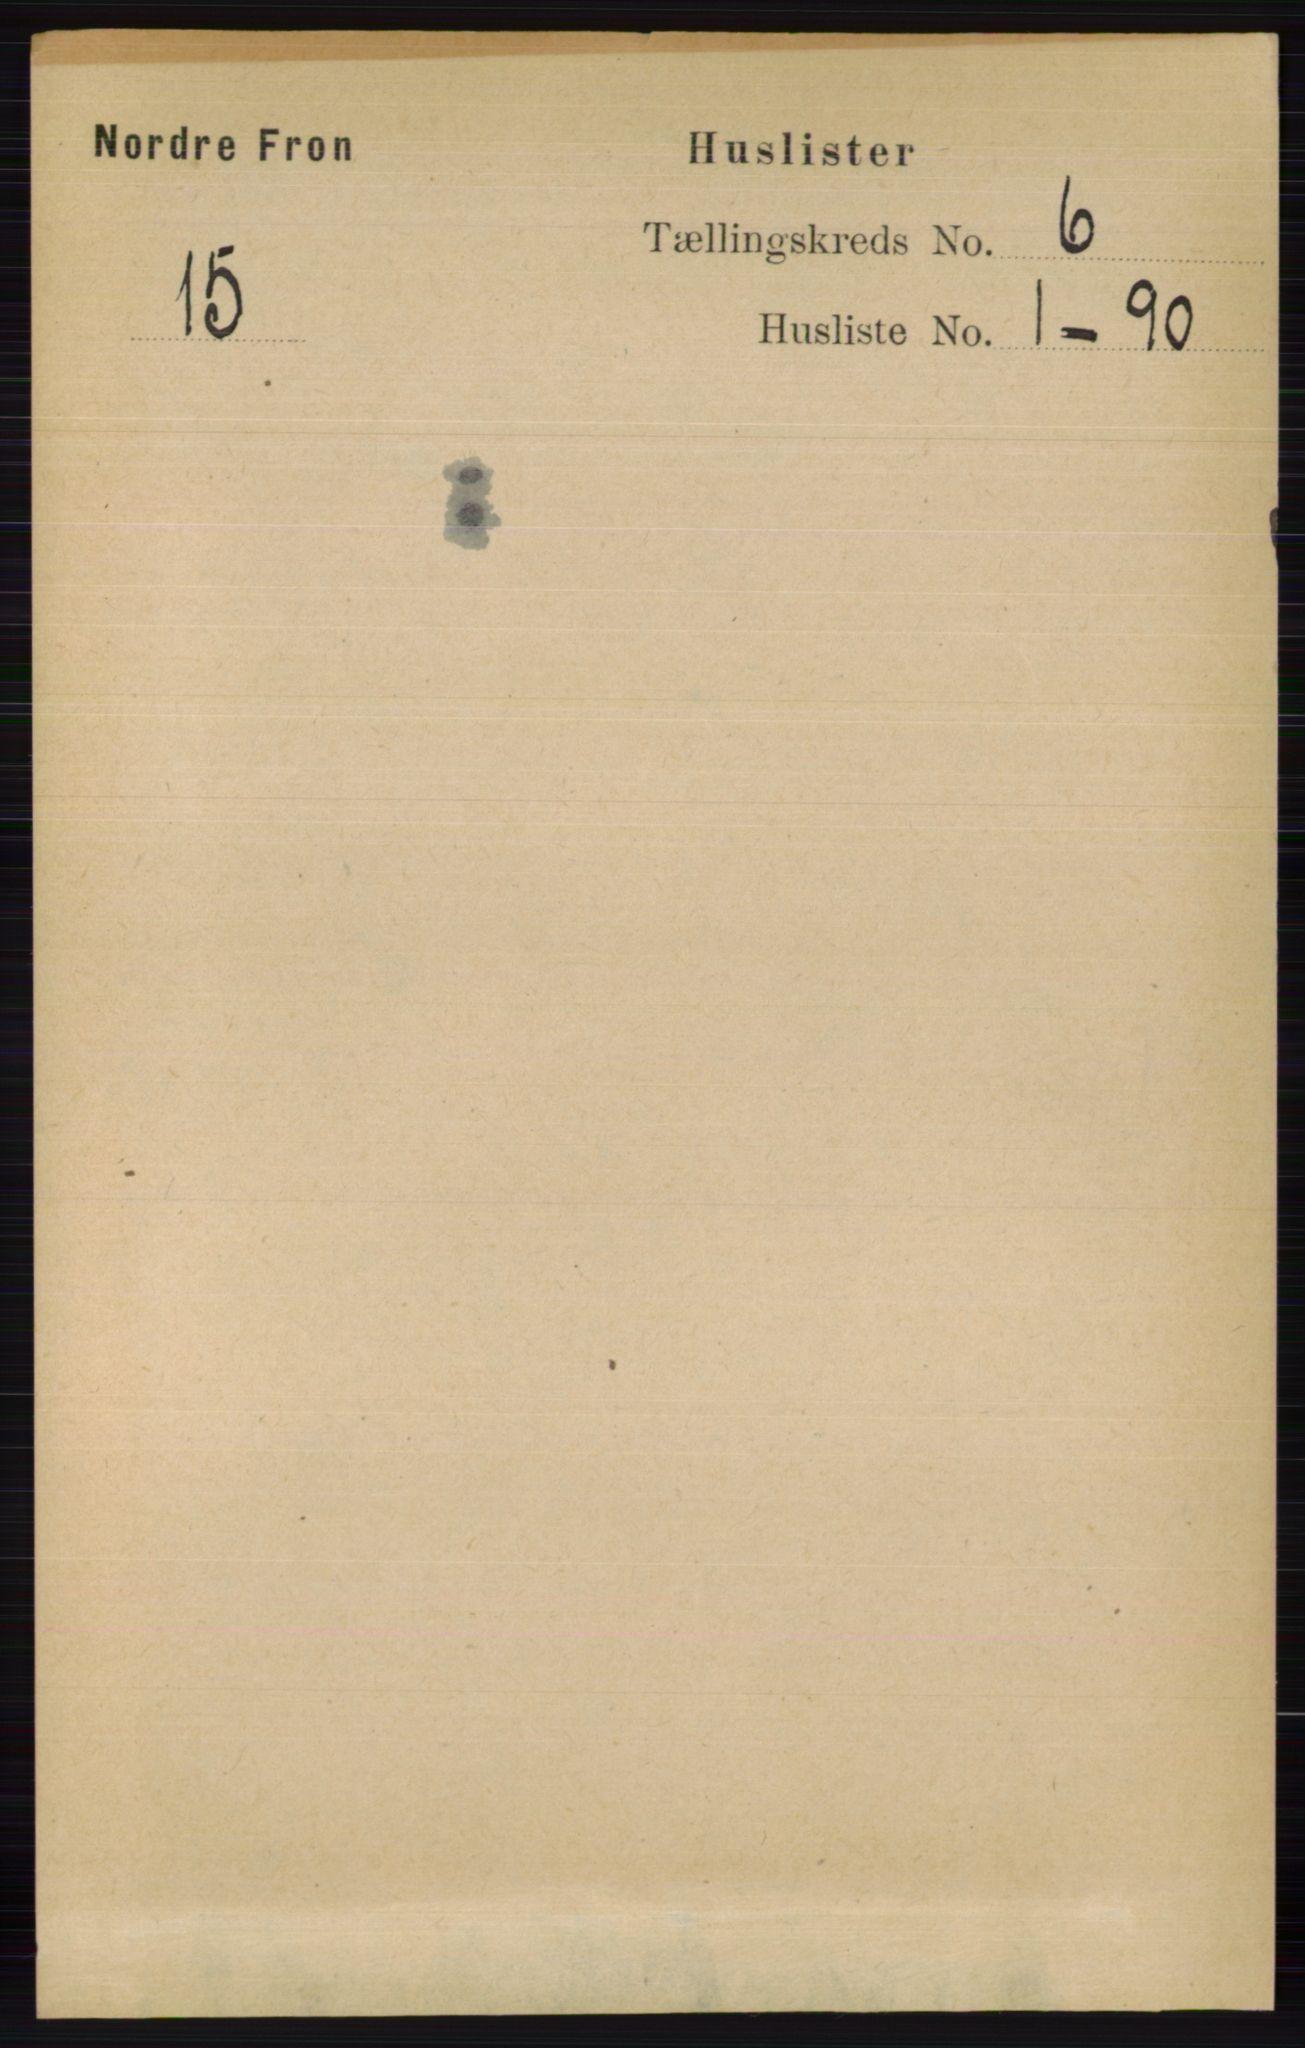 RA, Folketelling 1891 for 0518 Nord-Fron herred, 1891, s. 2165